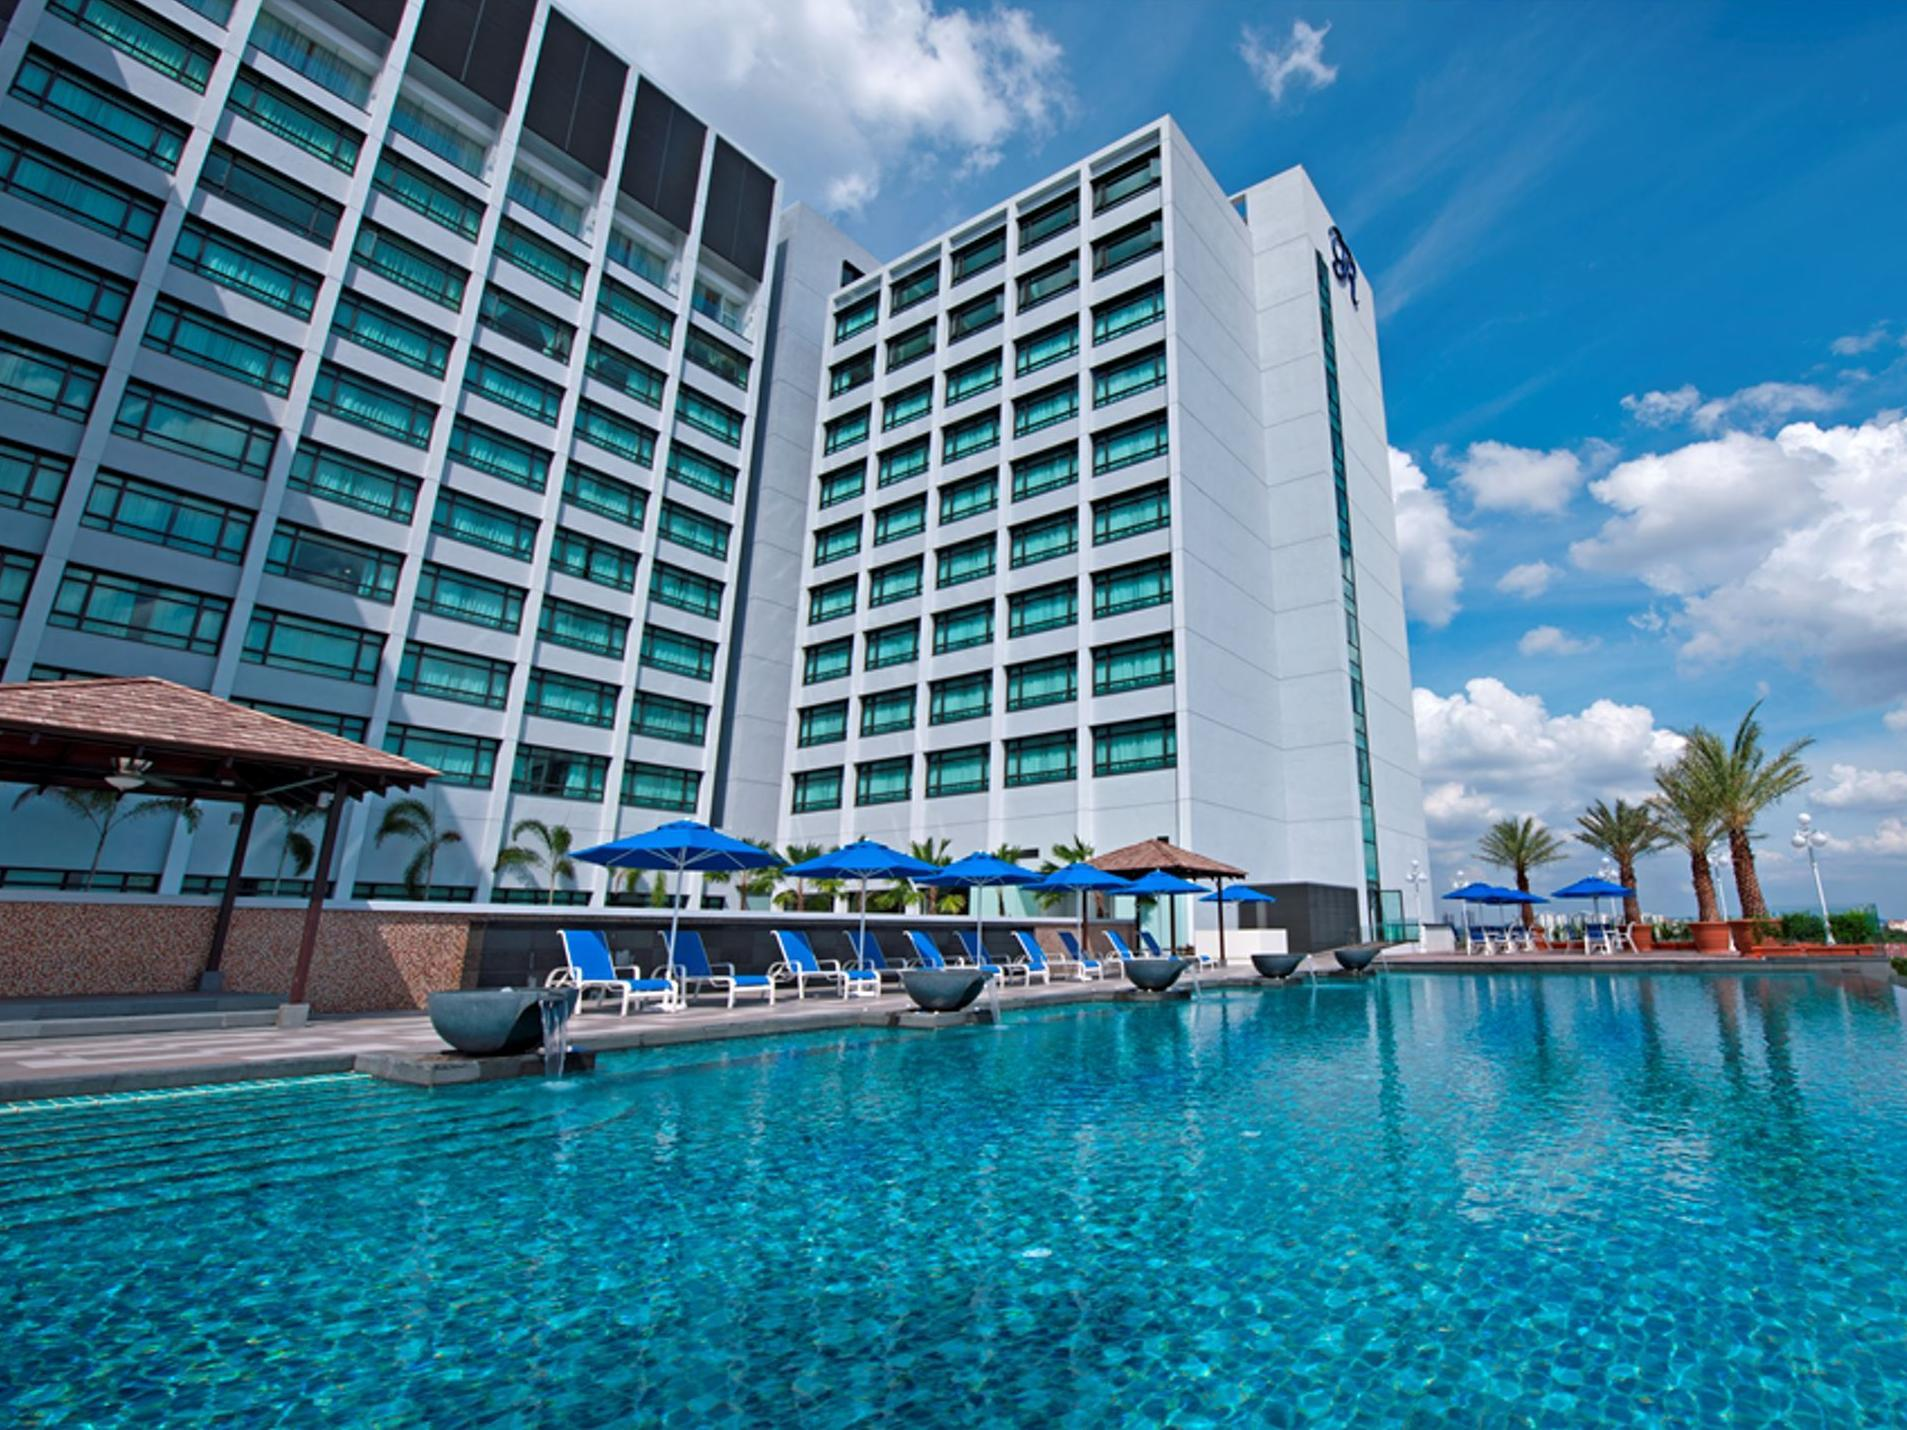 Royale Chulan Damansara - Hotels and Accommodation in Malaysia, Asia